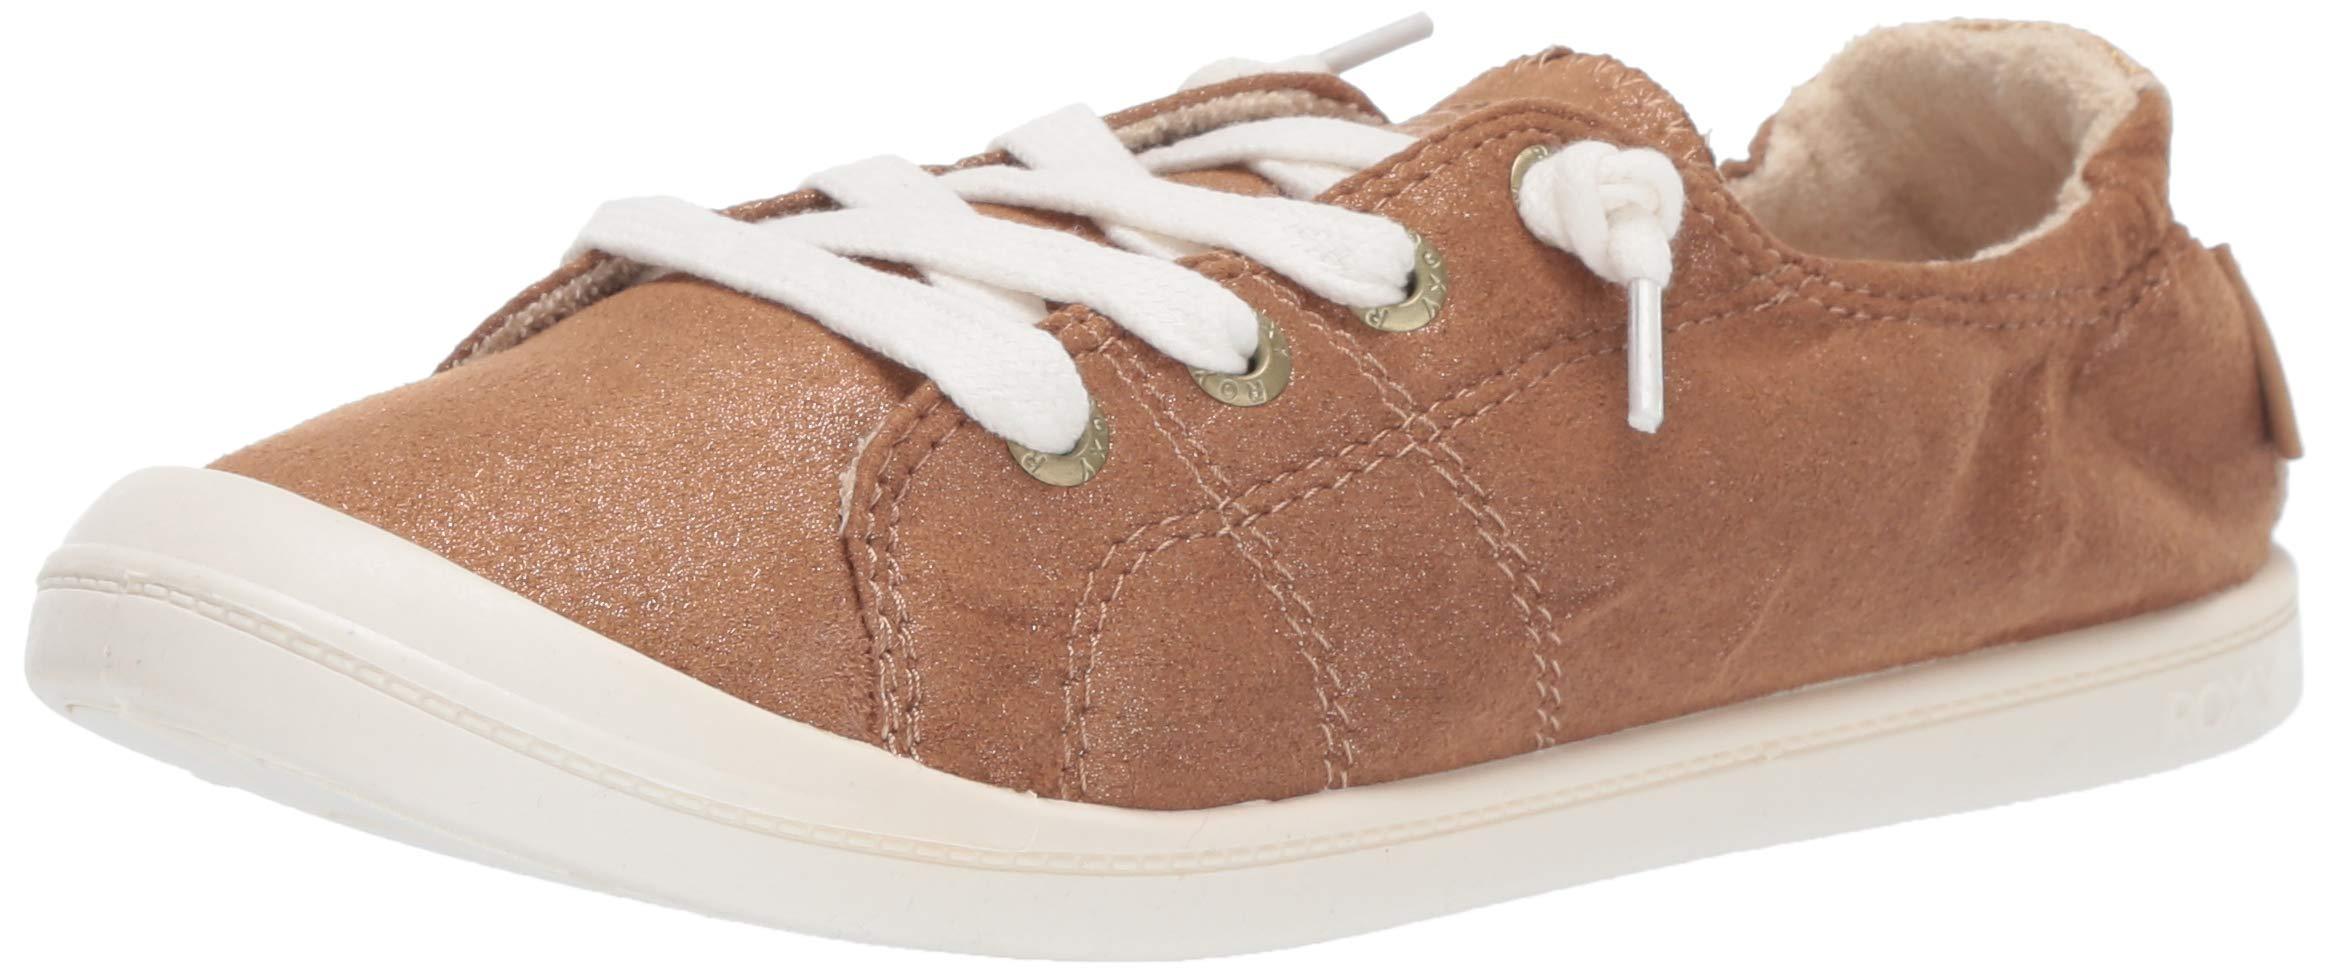 Roxy Women's Bayshore Slip on Shoe Sneaker, Bronze, 10 M US